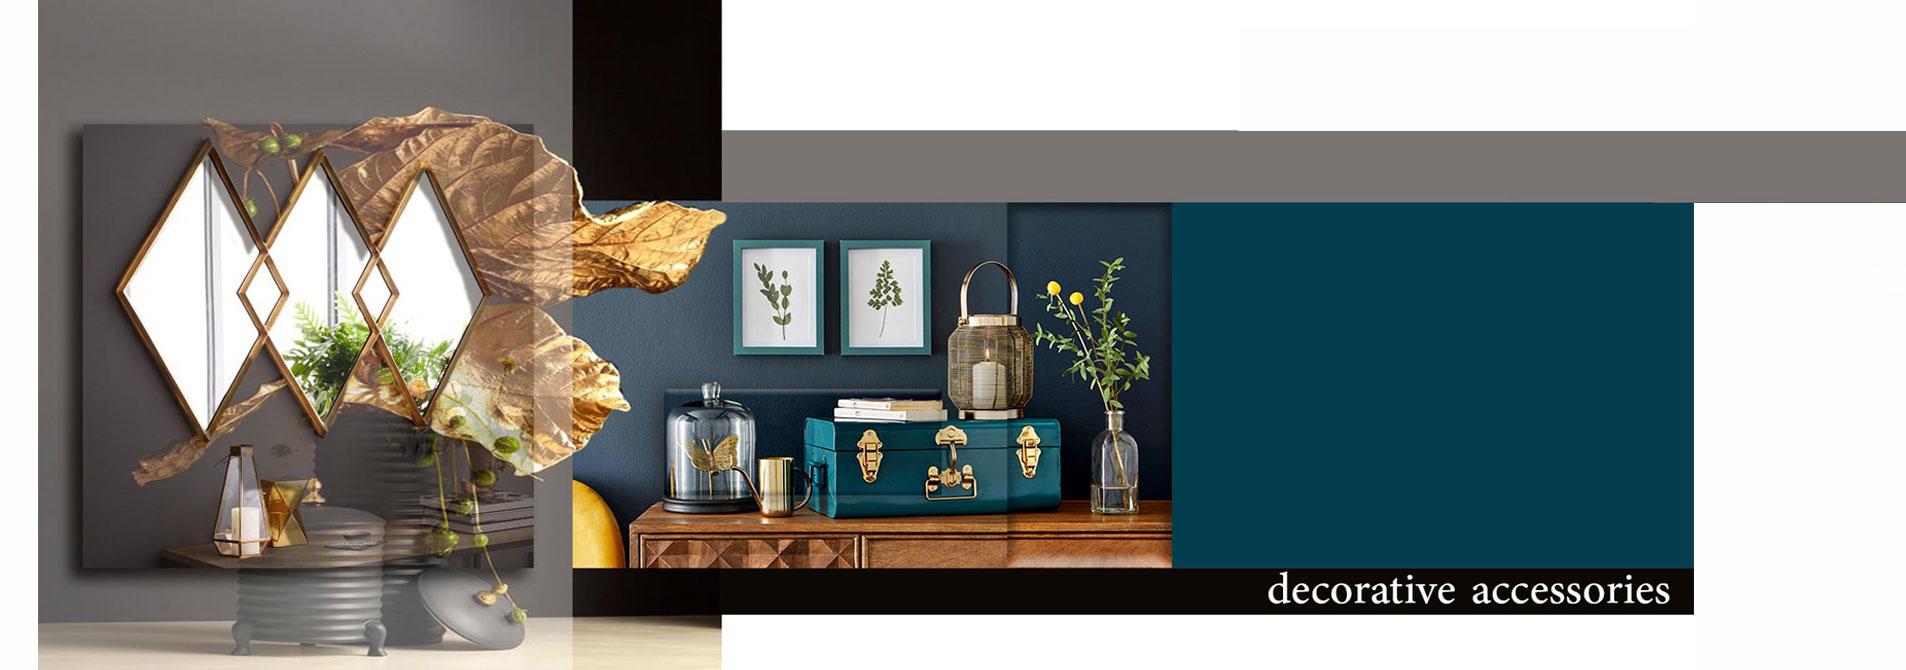 What are decorative  accessories a1 1 - لوازم دکوری چه چیزهایی هستند؟